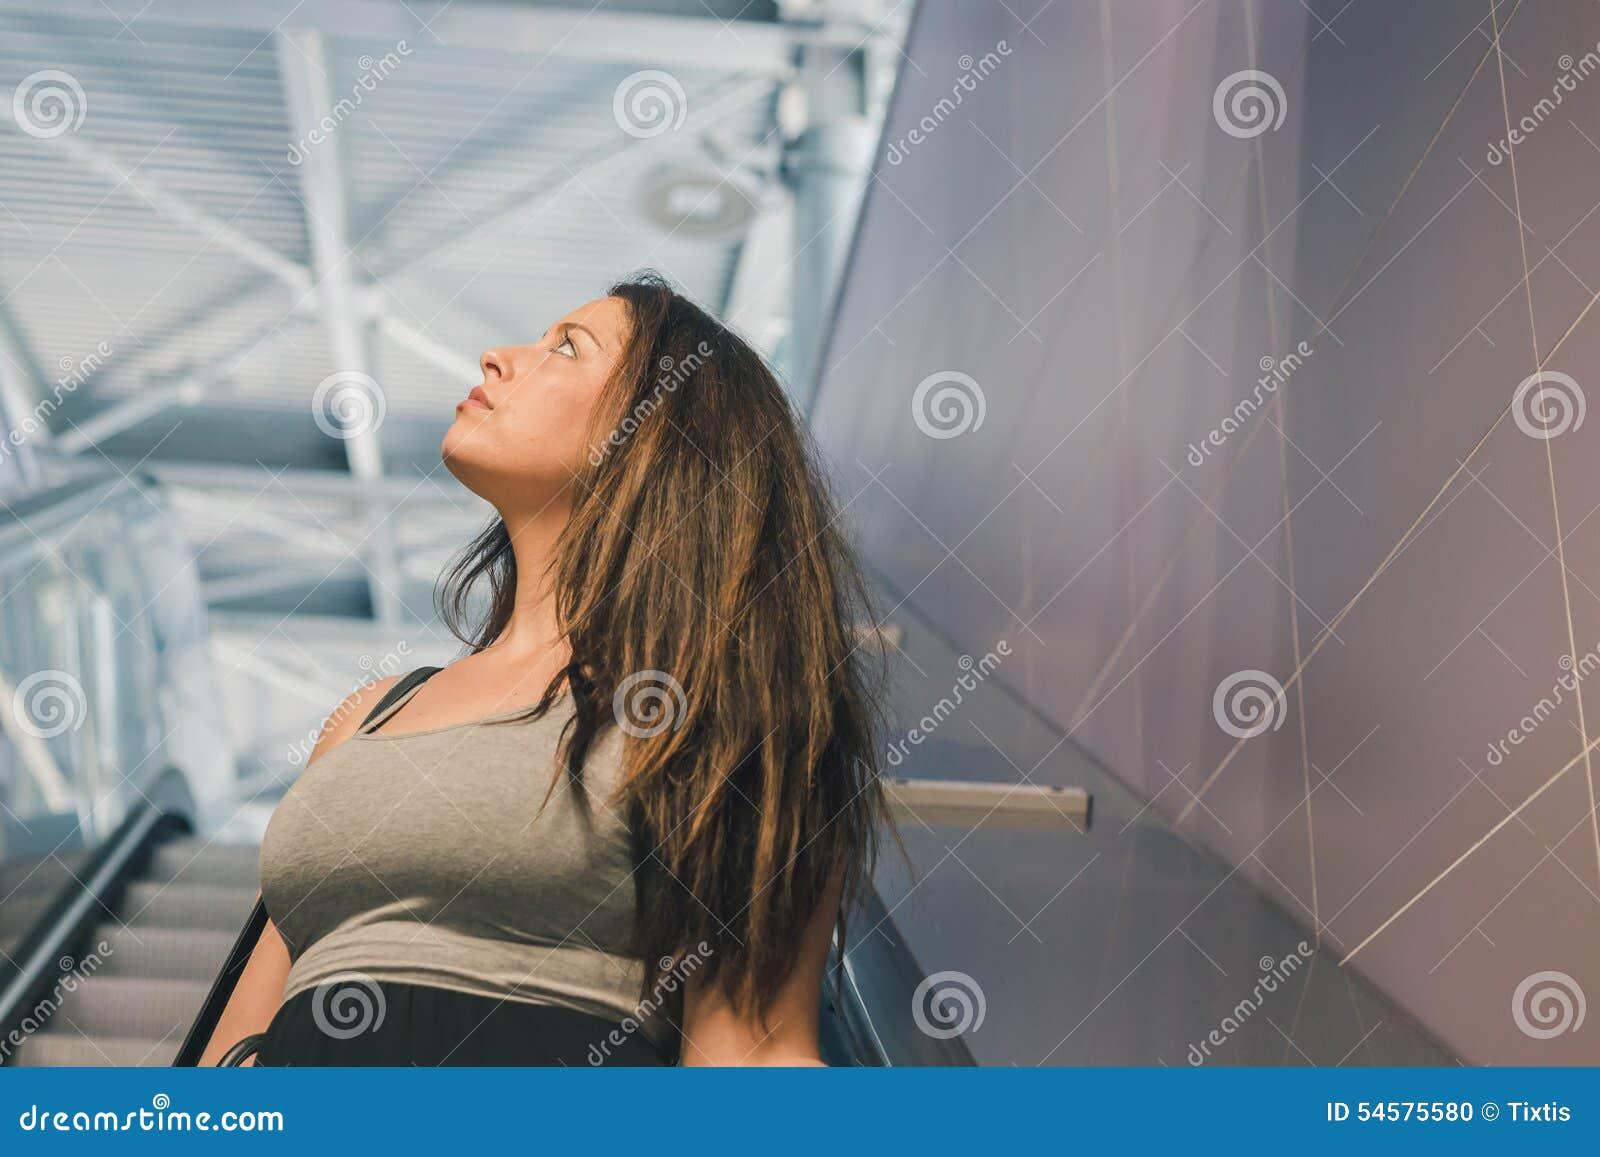 Beautiful Curvy Girl Posing On Escalator Stock Photo - Image